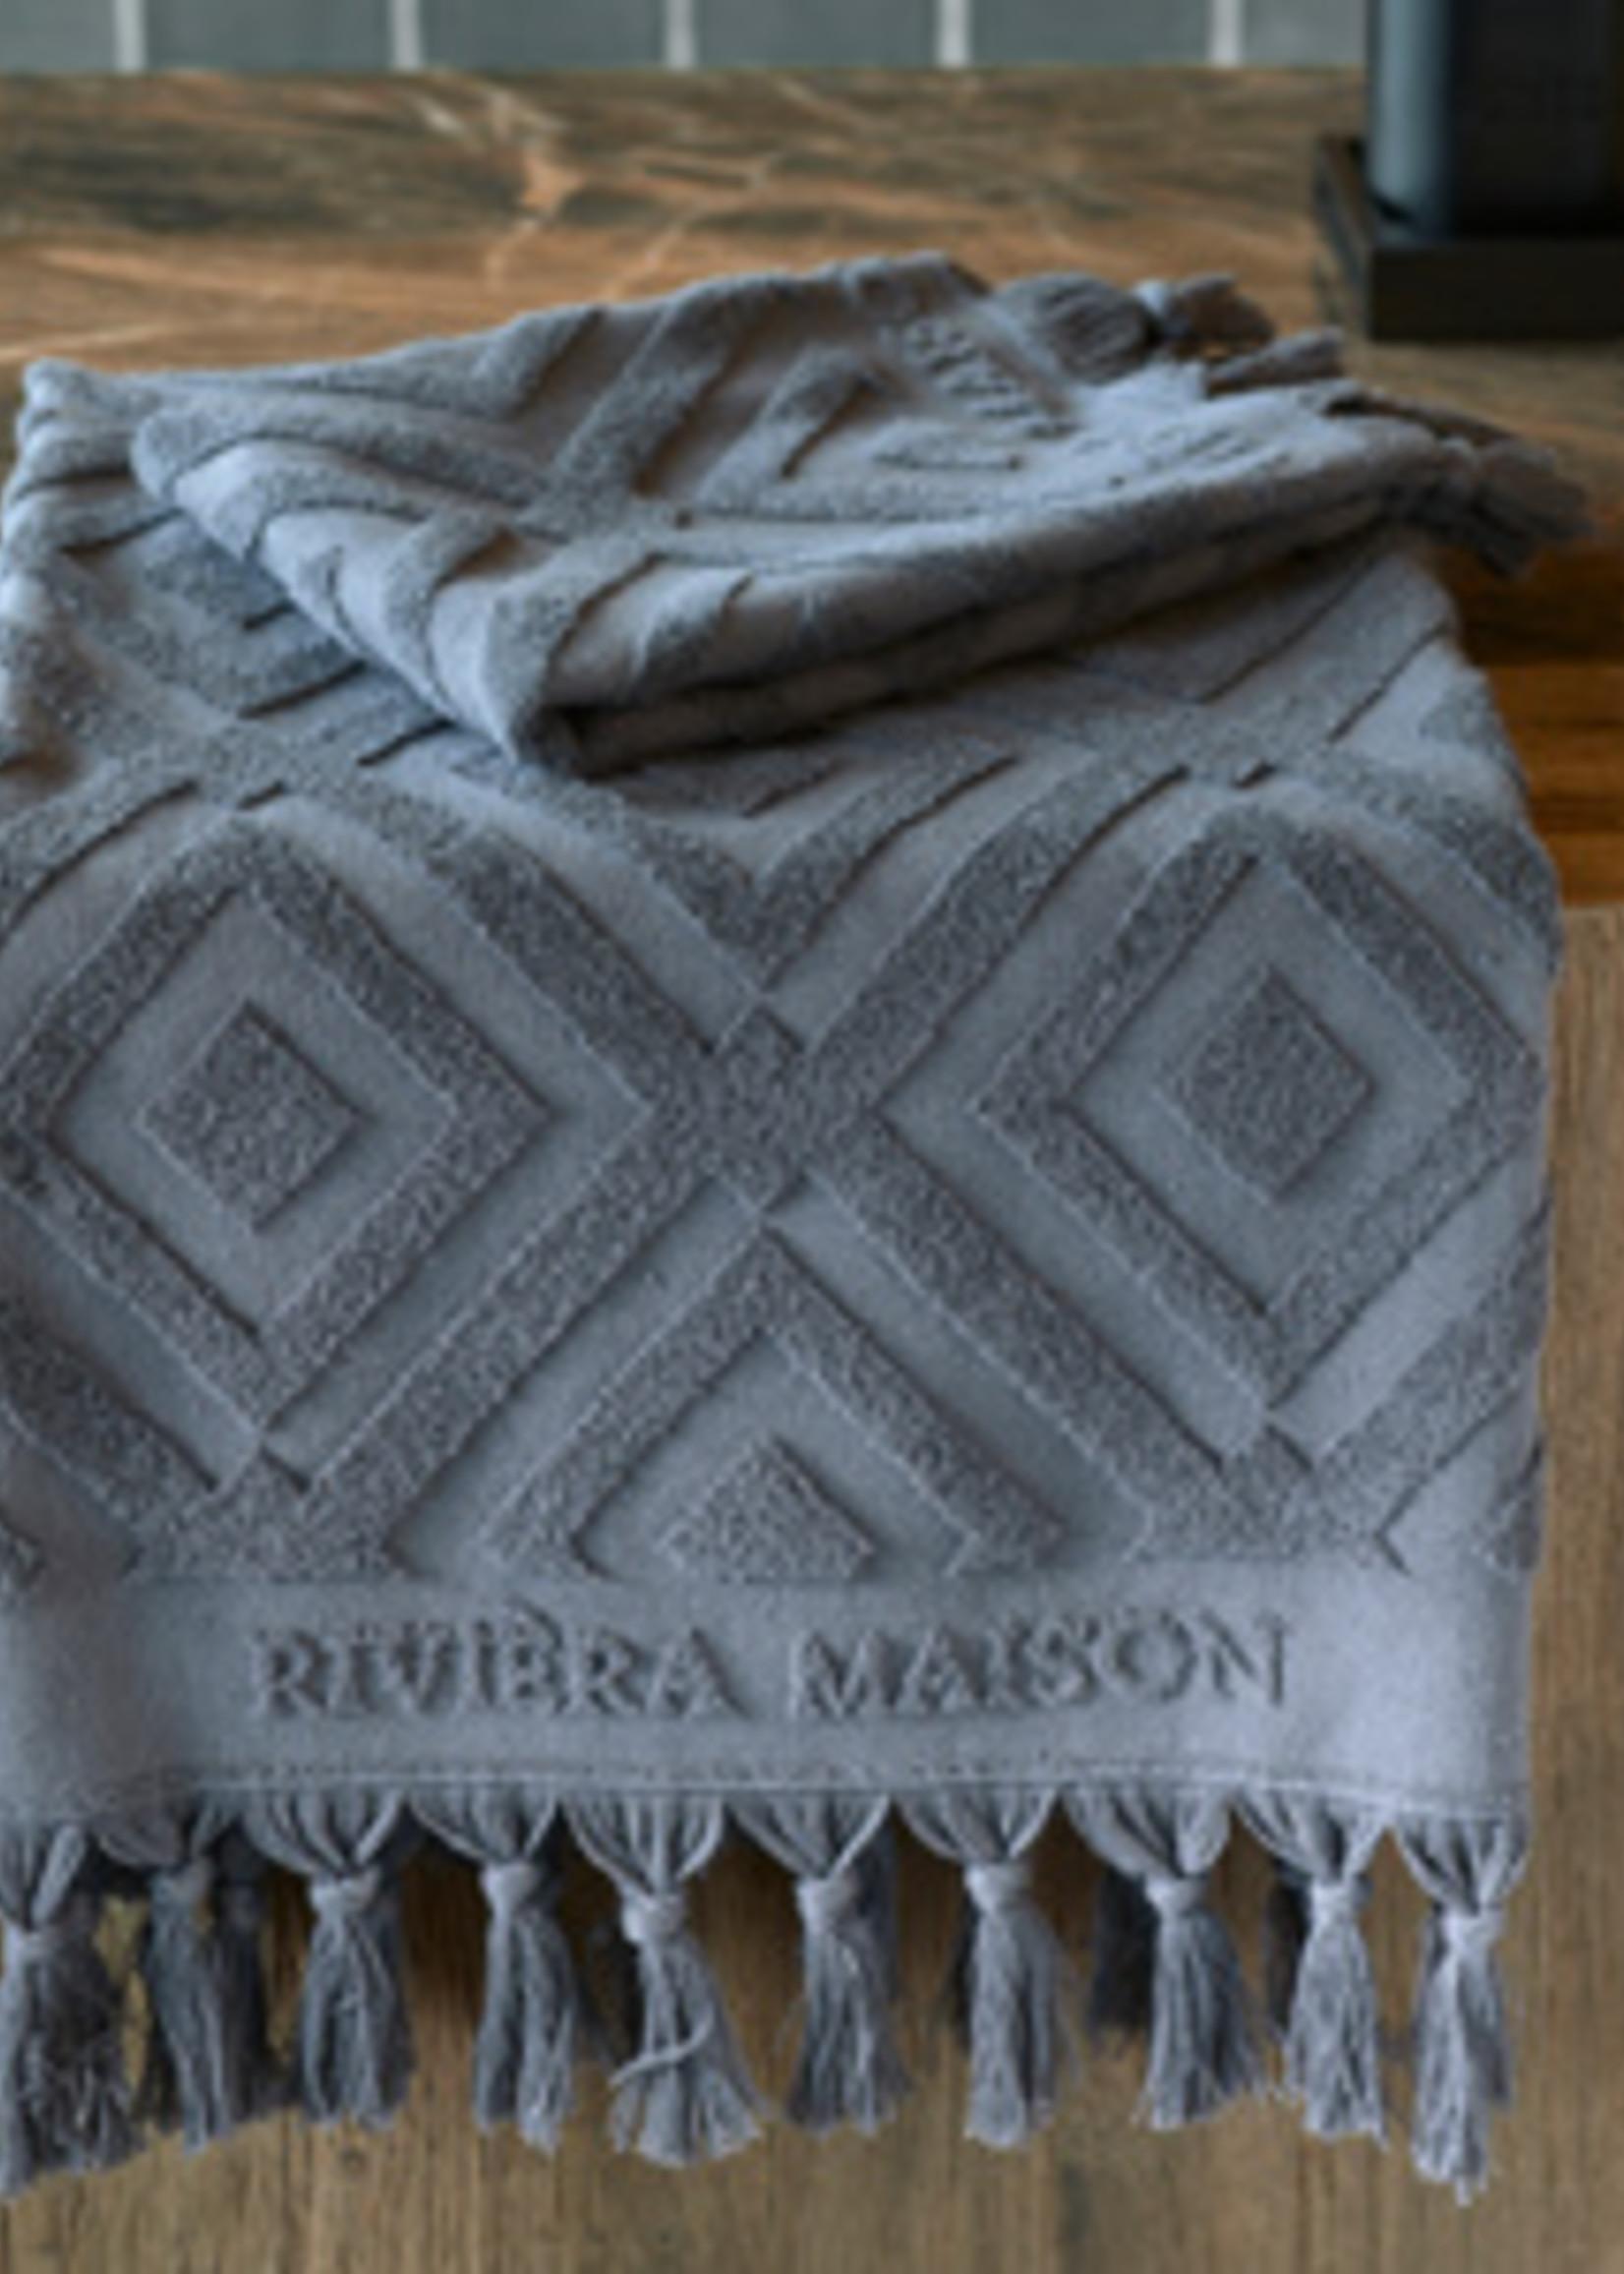 Riviera Maison RM Chic Towel anthracite 140x70